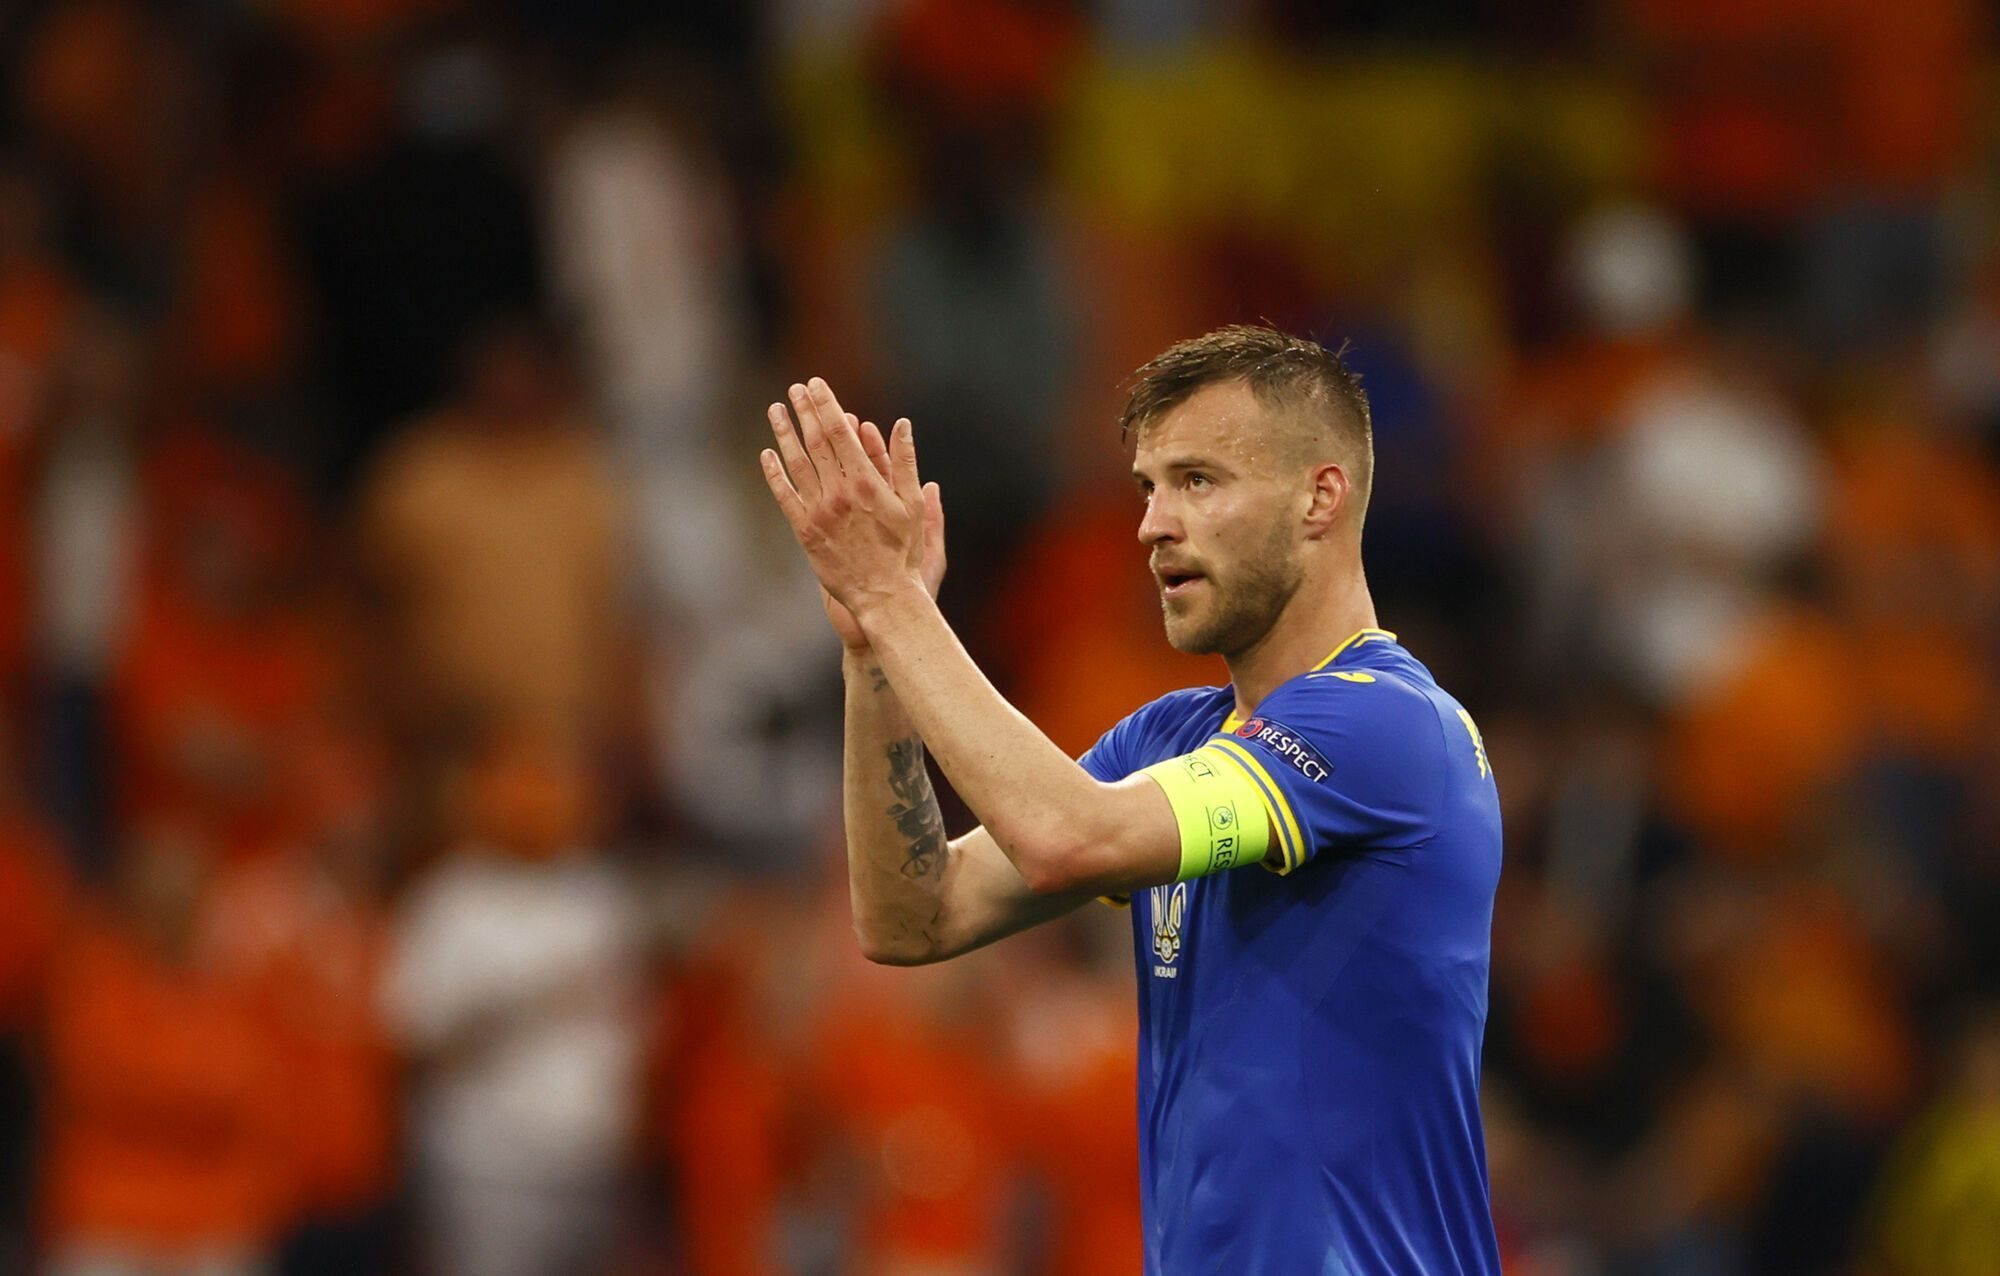 Андрей Ярмоленко аплодирует фанатам